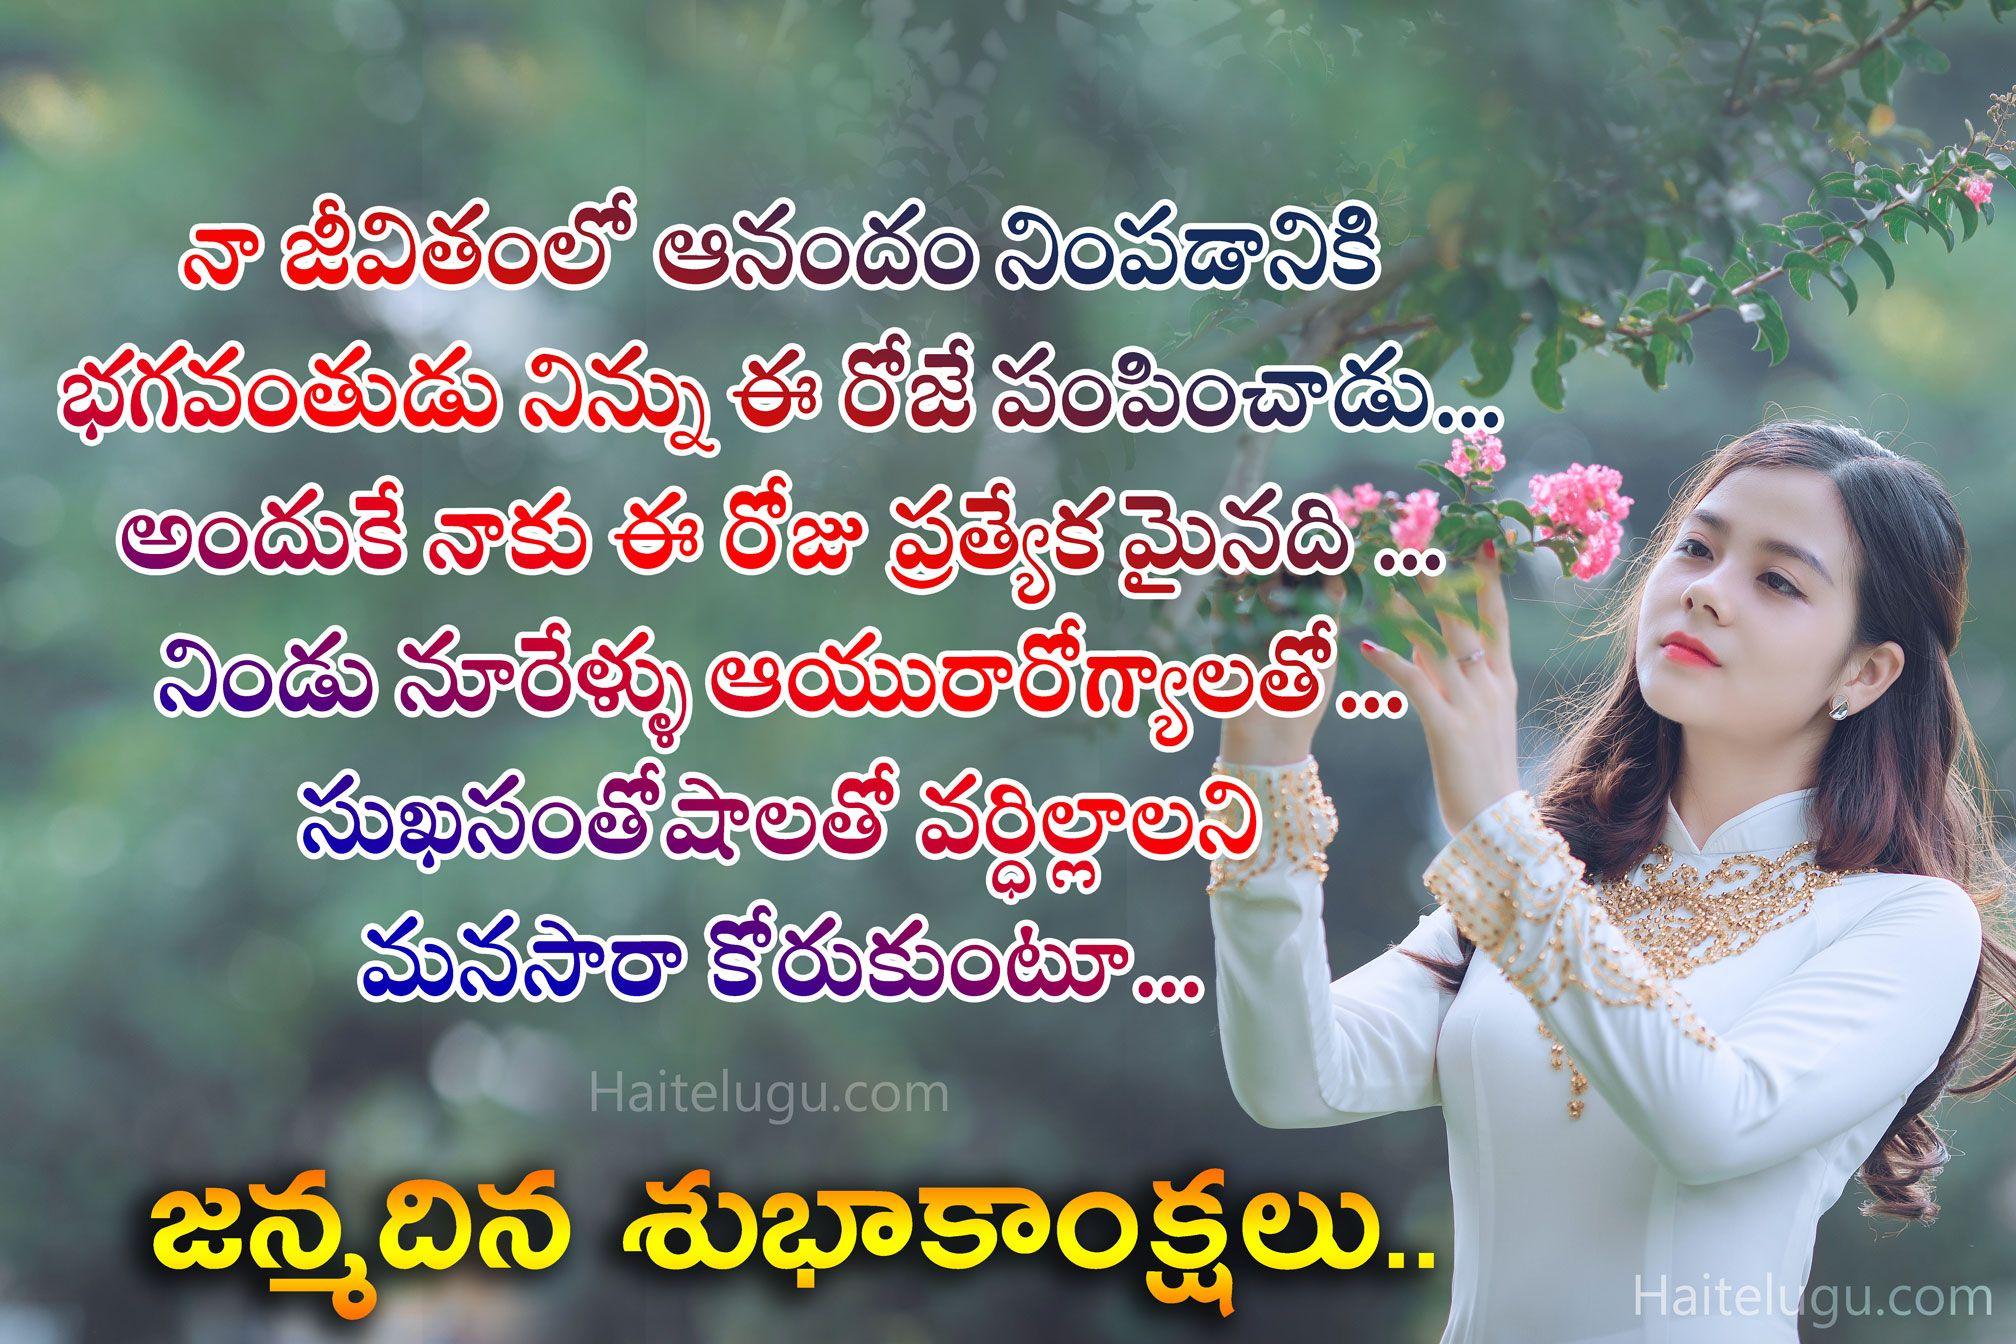 Pin on Wishes in Telugu